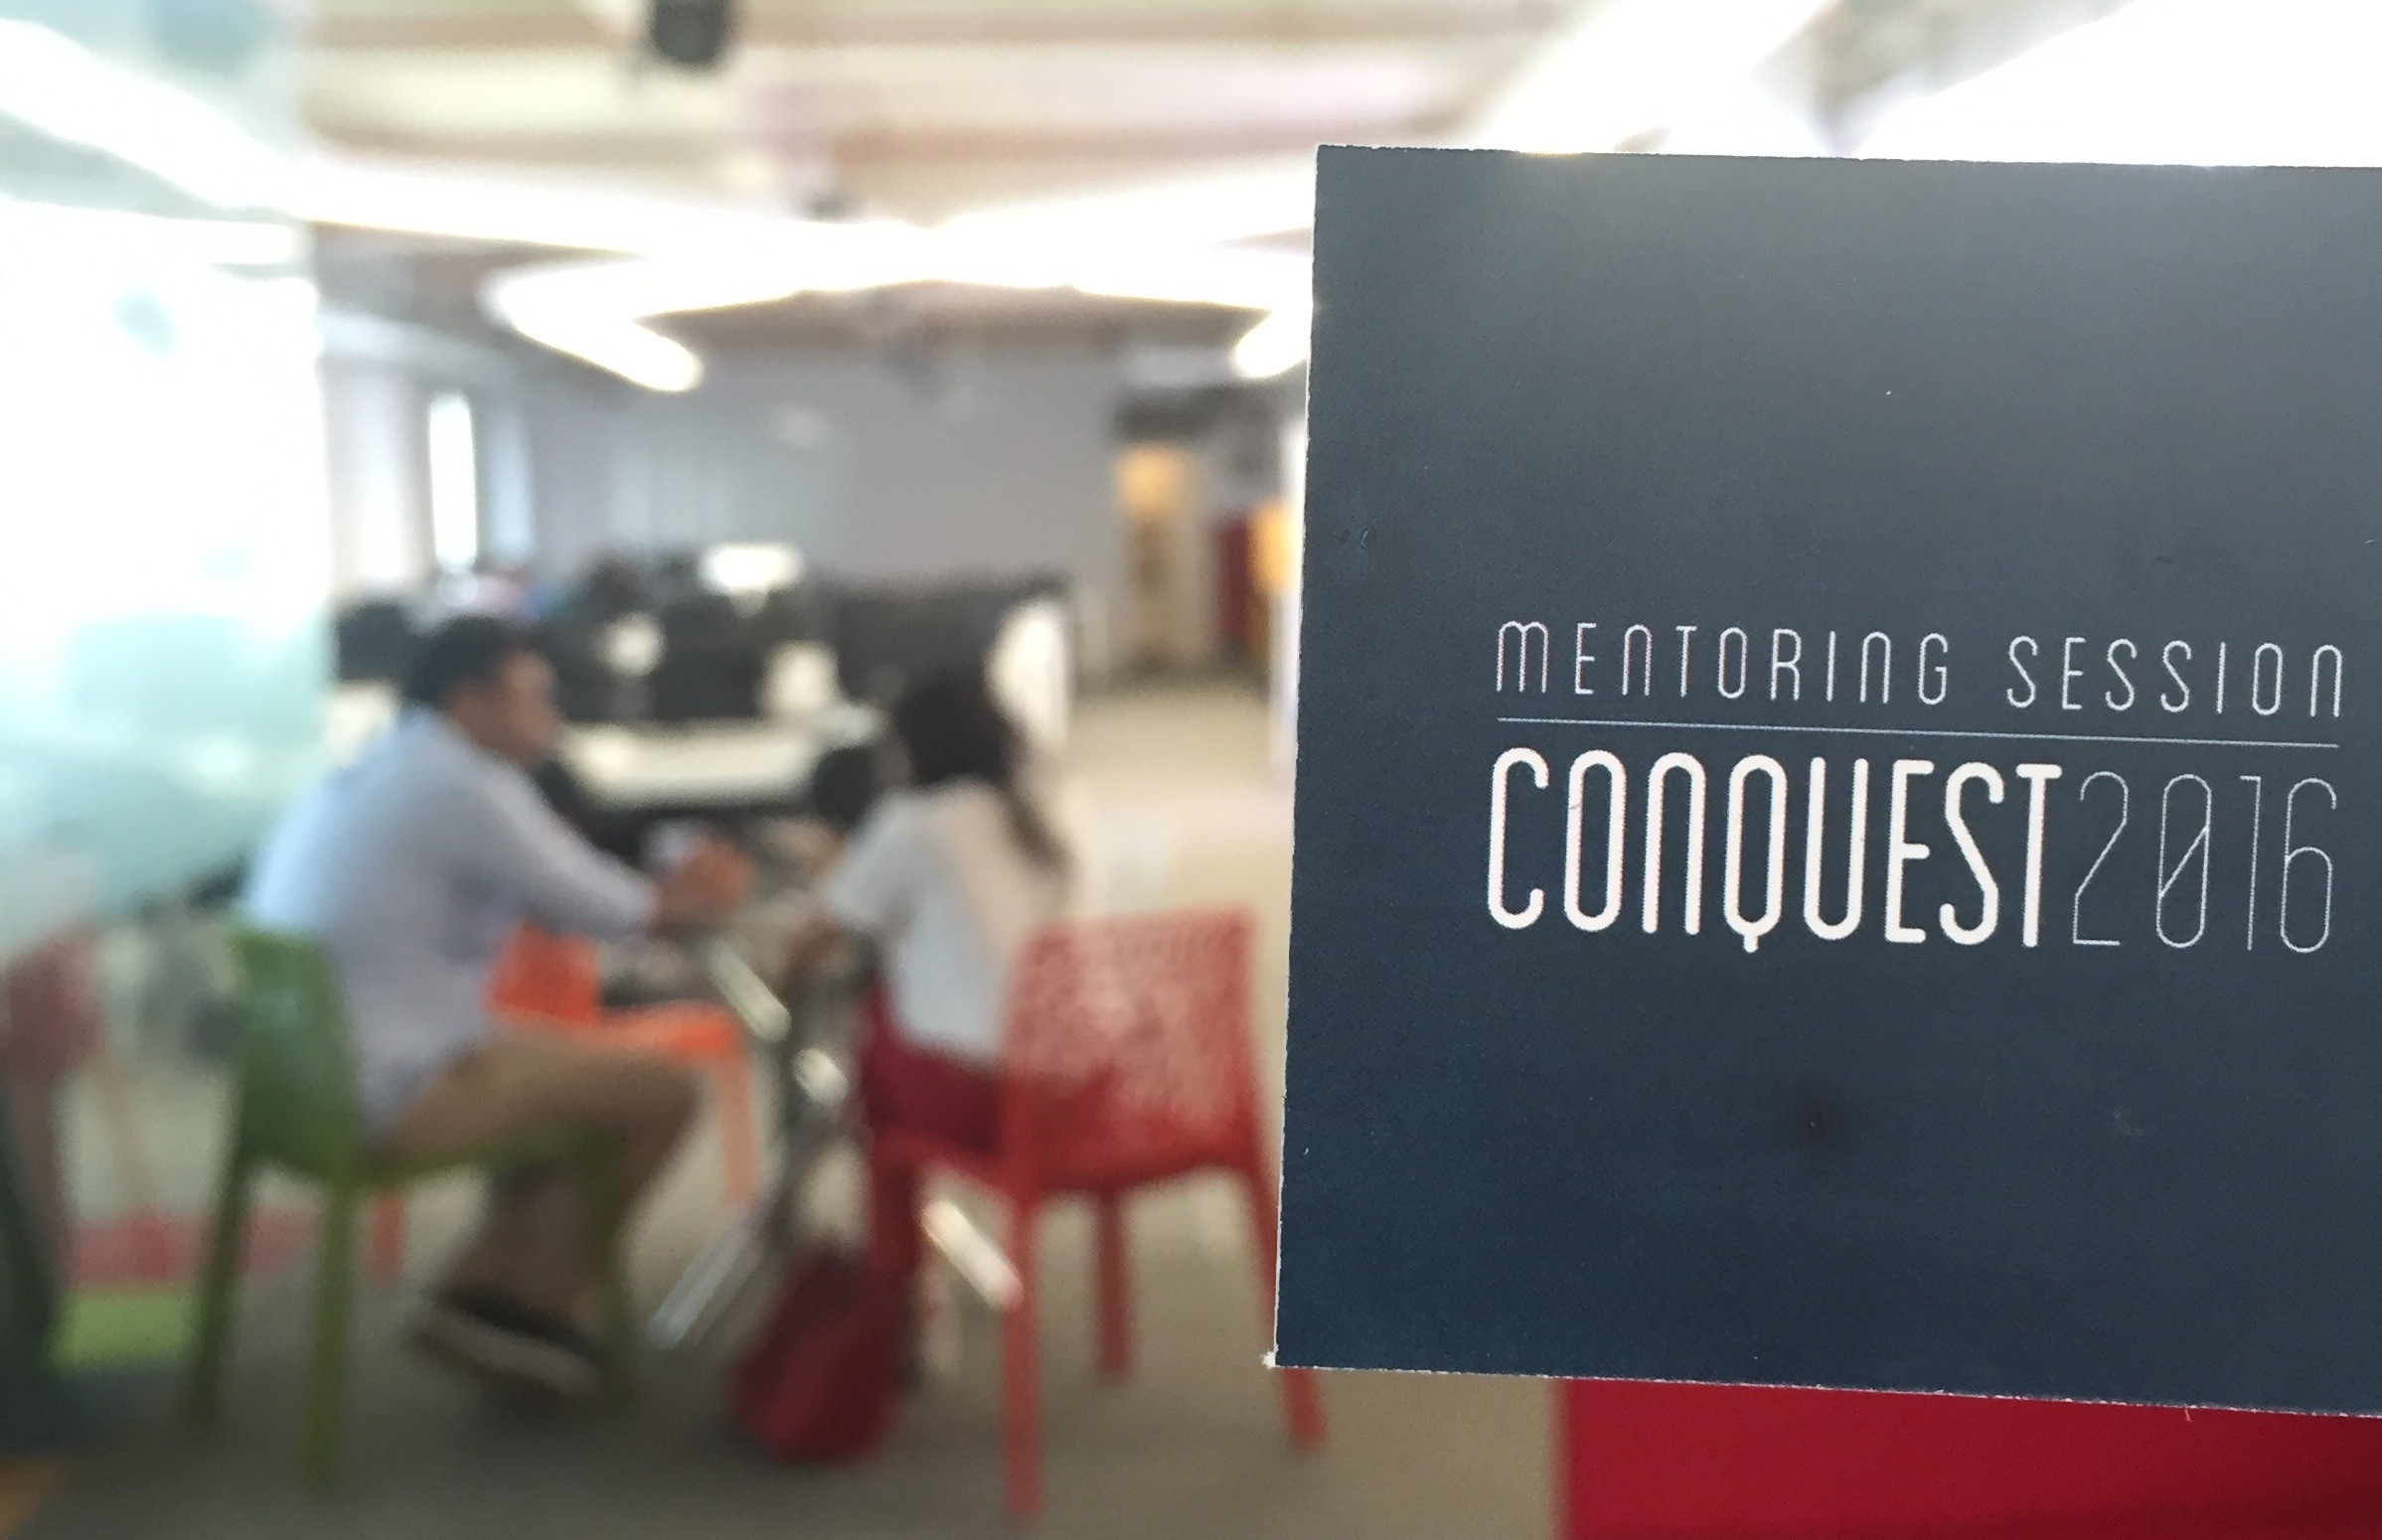 conquest 2016 bangalore